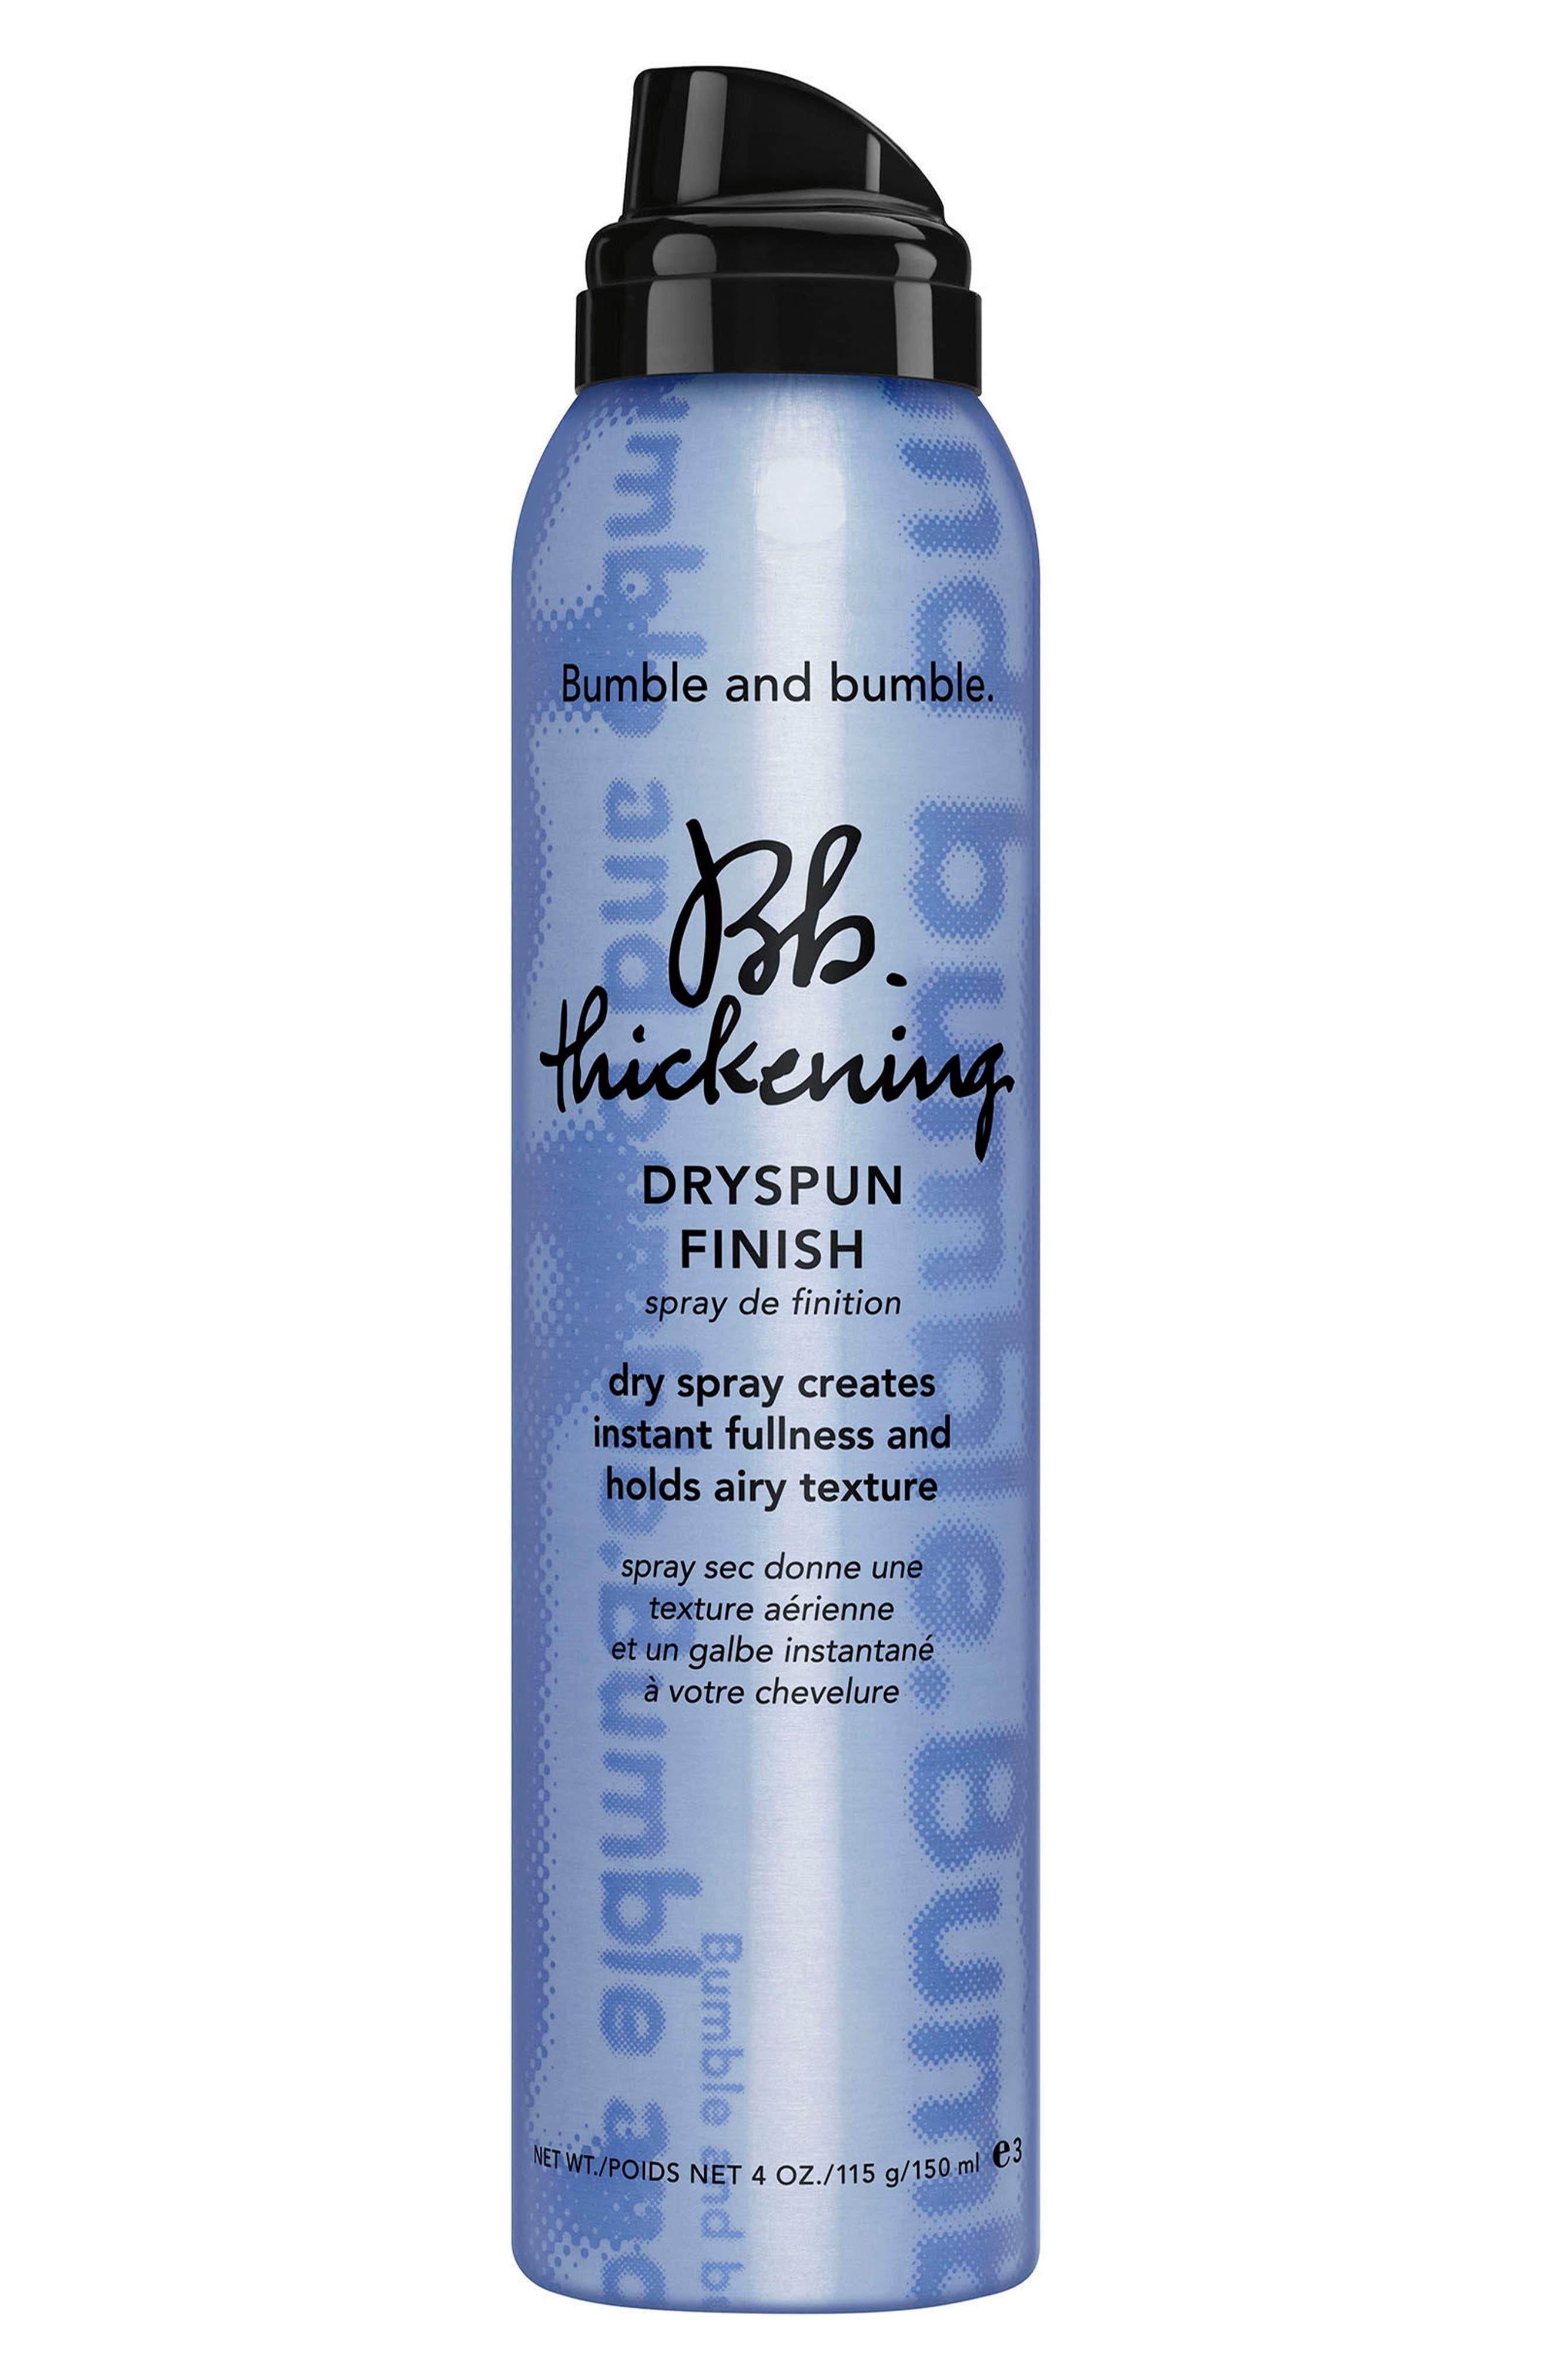 Thickening Dryspun Finish Dry Spray,                         Main,                         color, NO COLOR